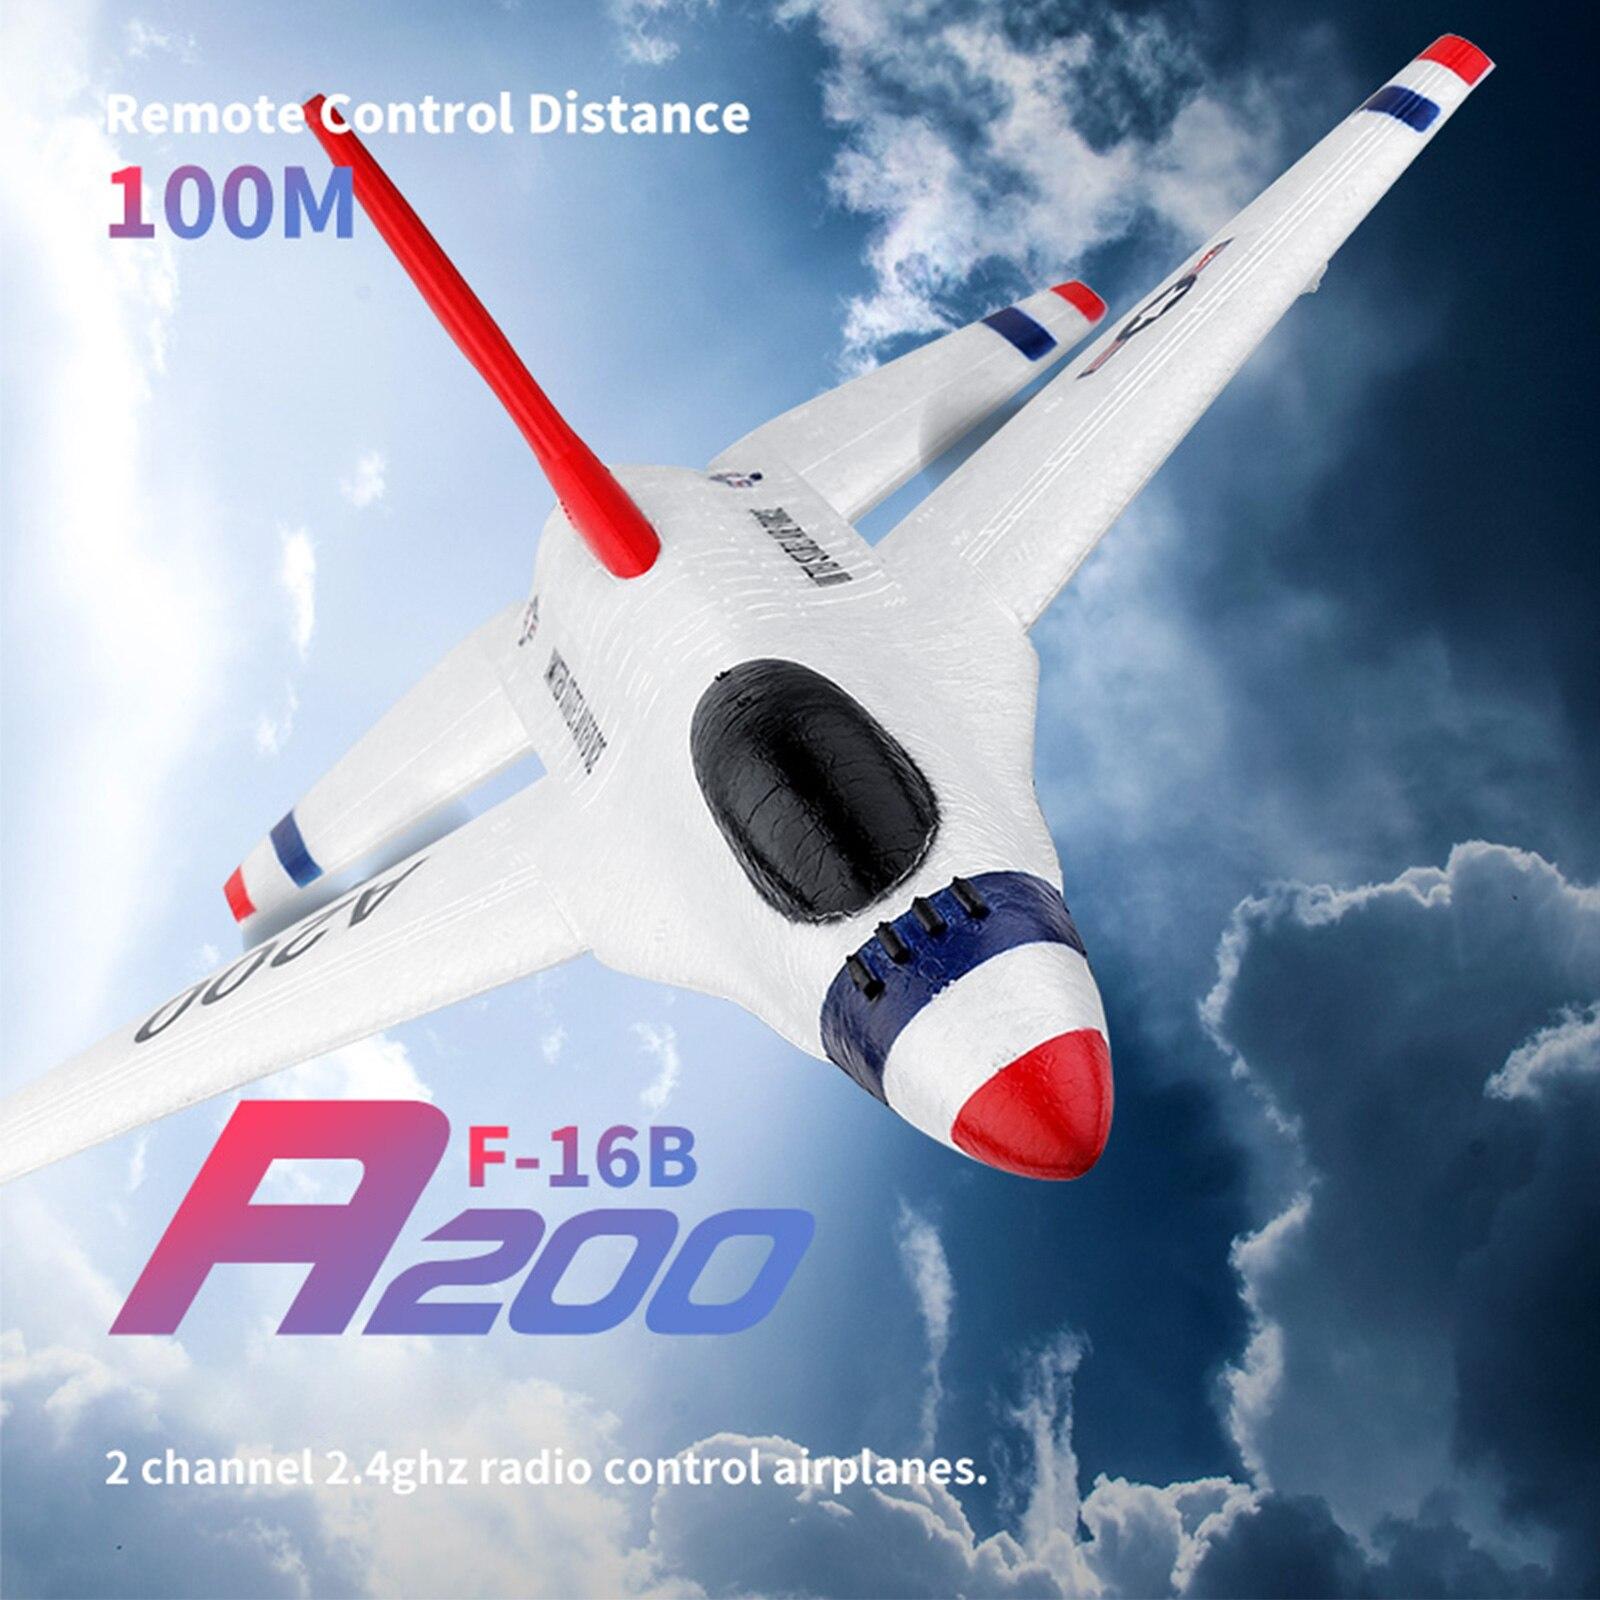 Wltoys XK A200 F-16B F16 RC Plane